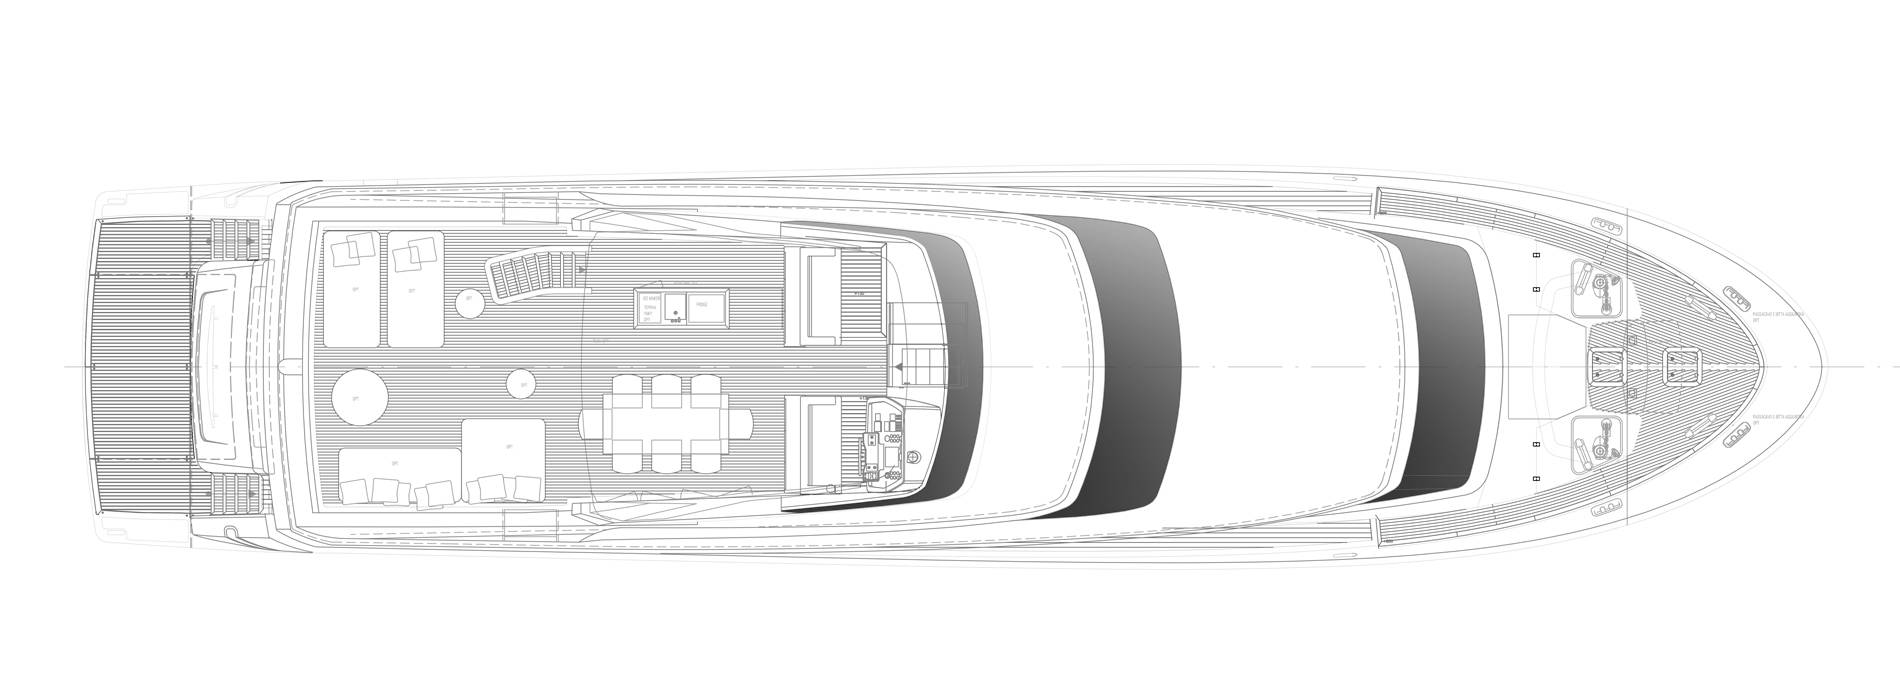 Sanlorenzo Yachts SL96-631 under offer Флайбридж